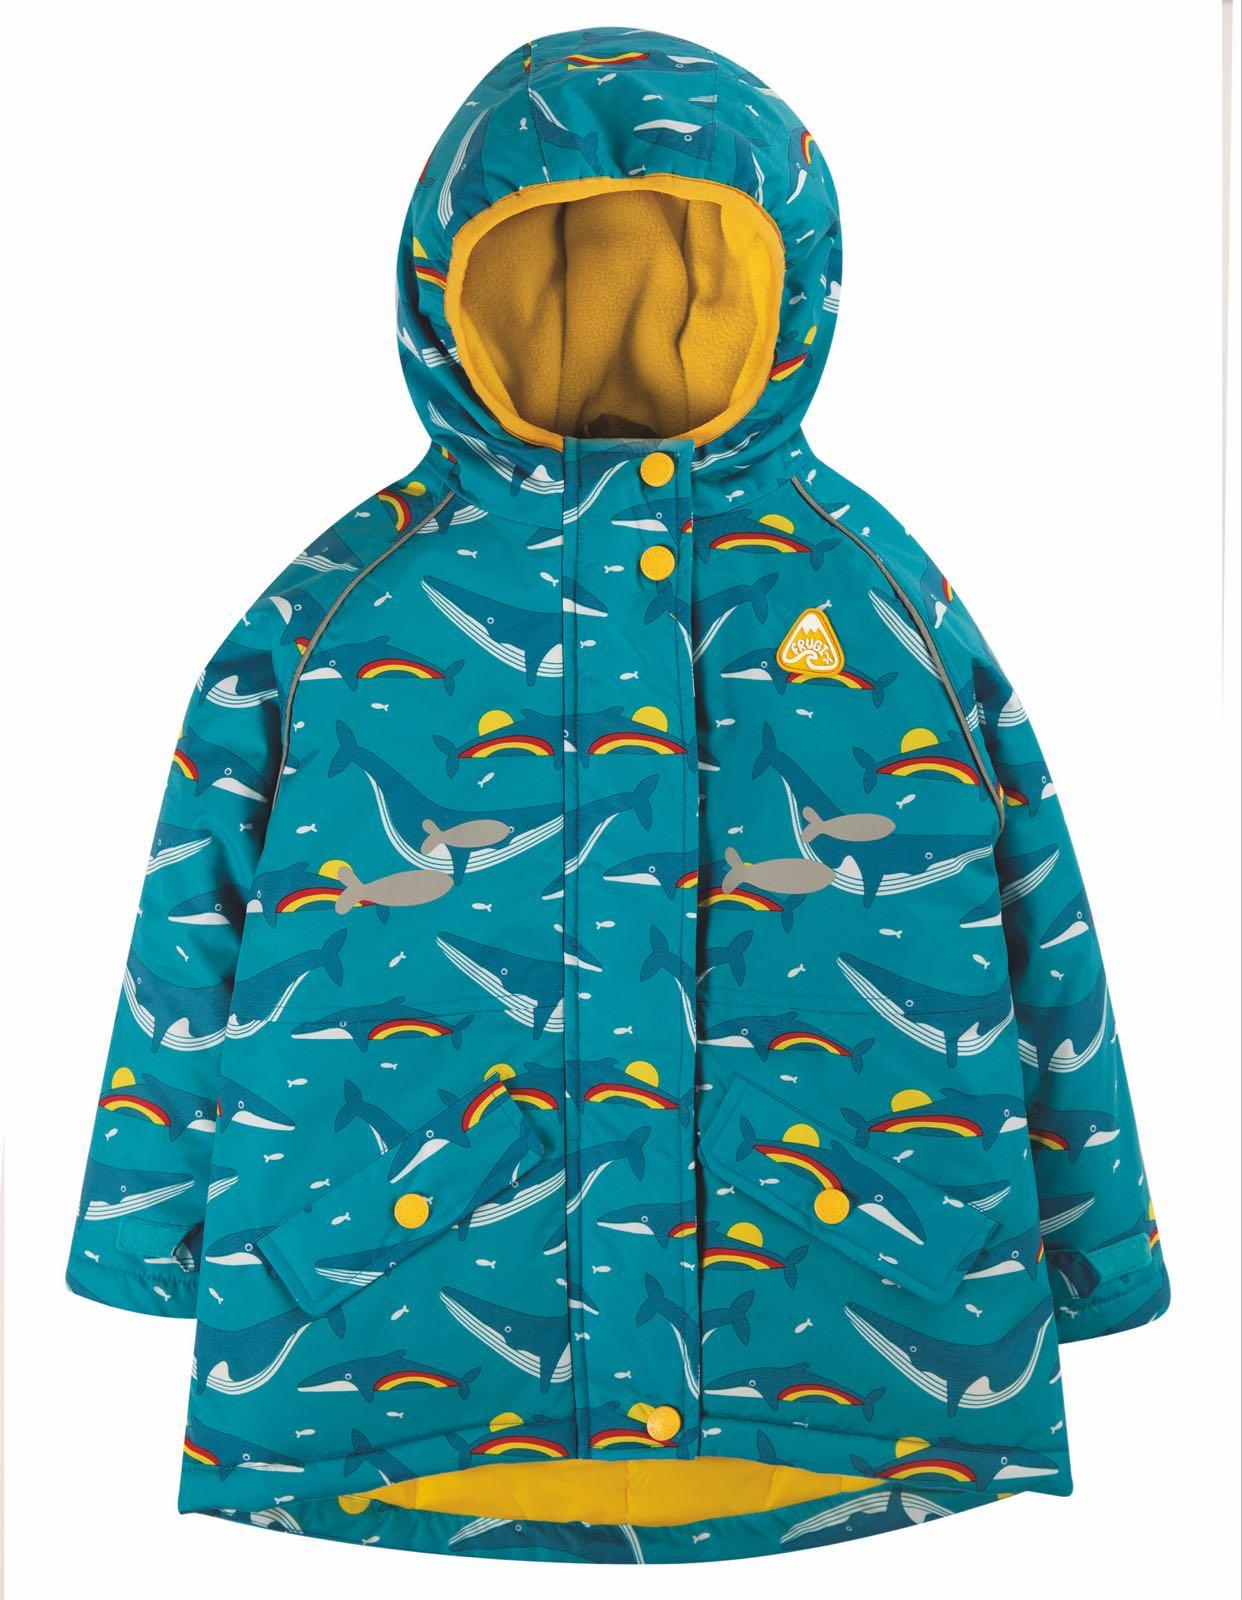 Frugi Explorer Waterproof Coat, Rainbow Whales